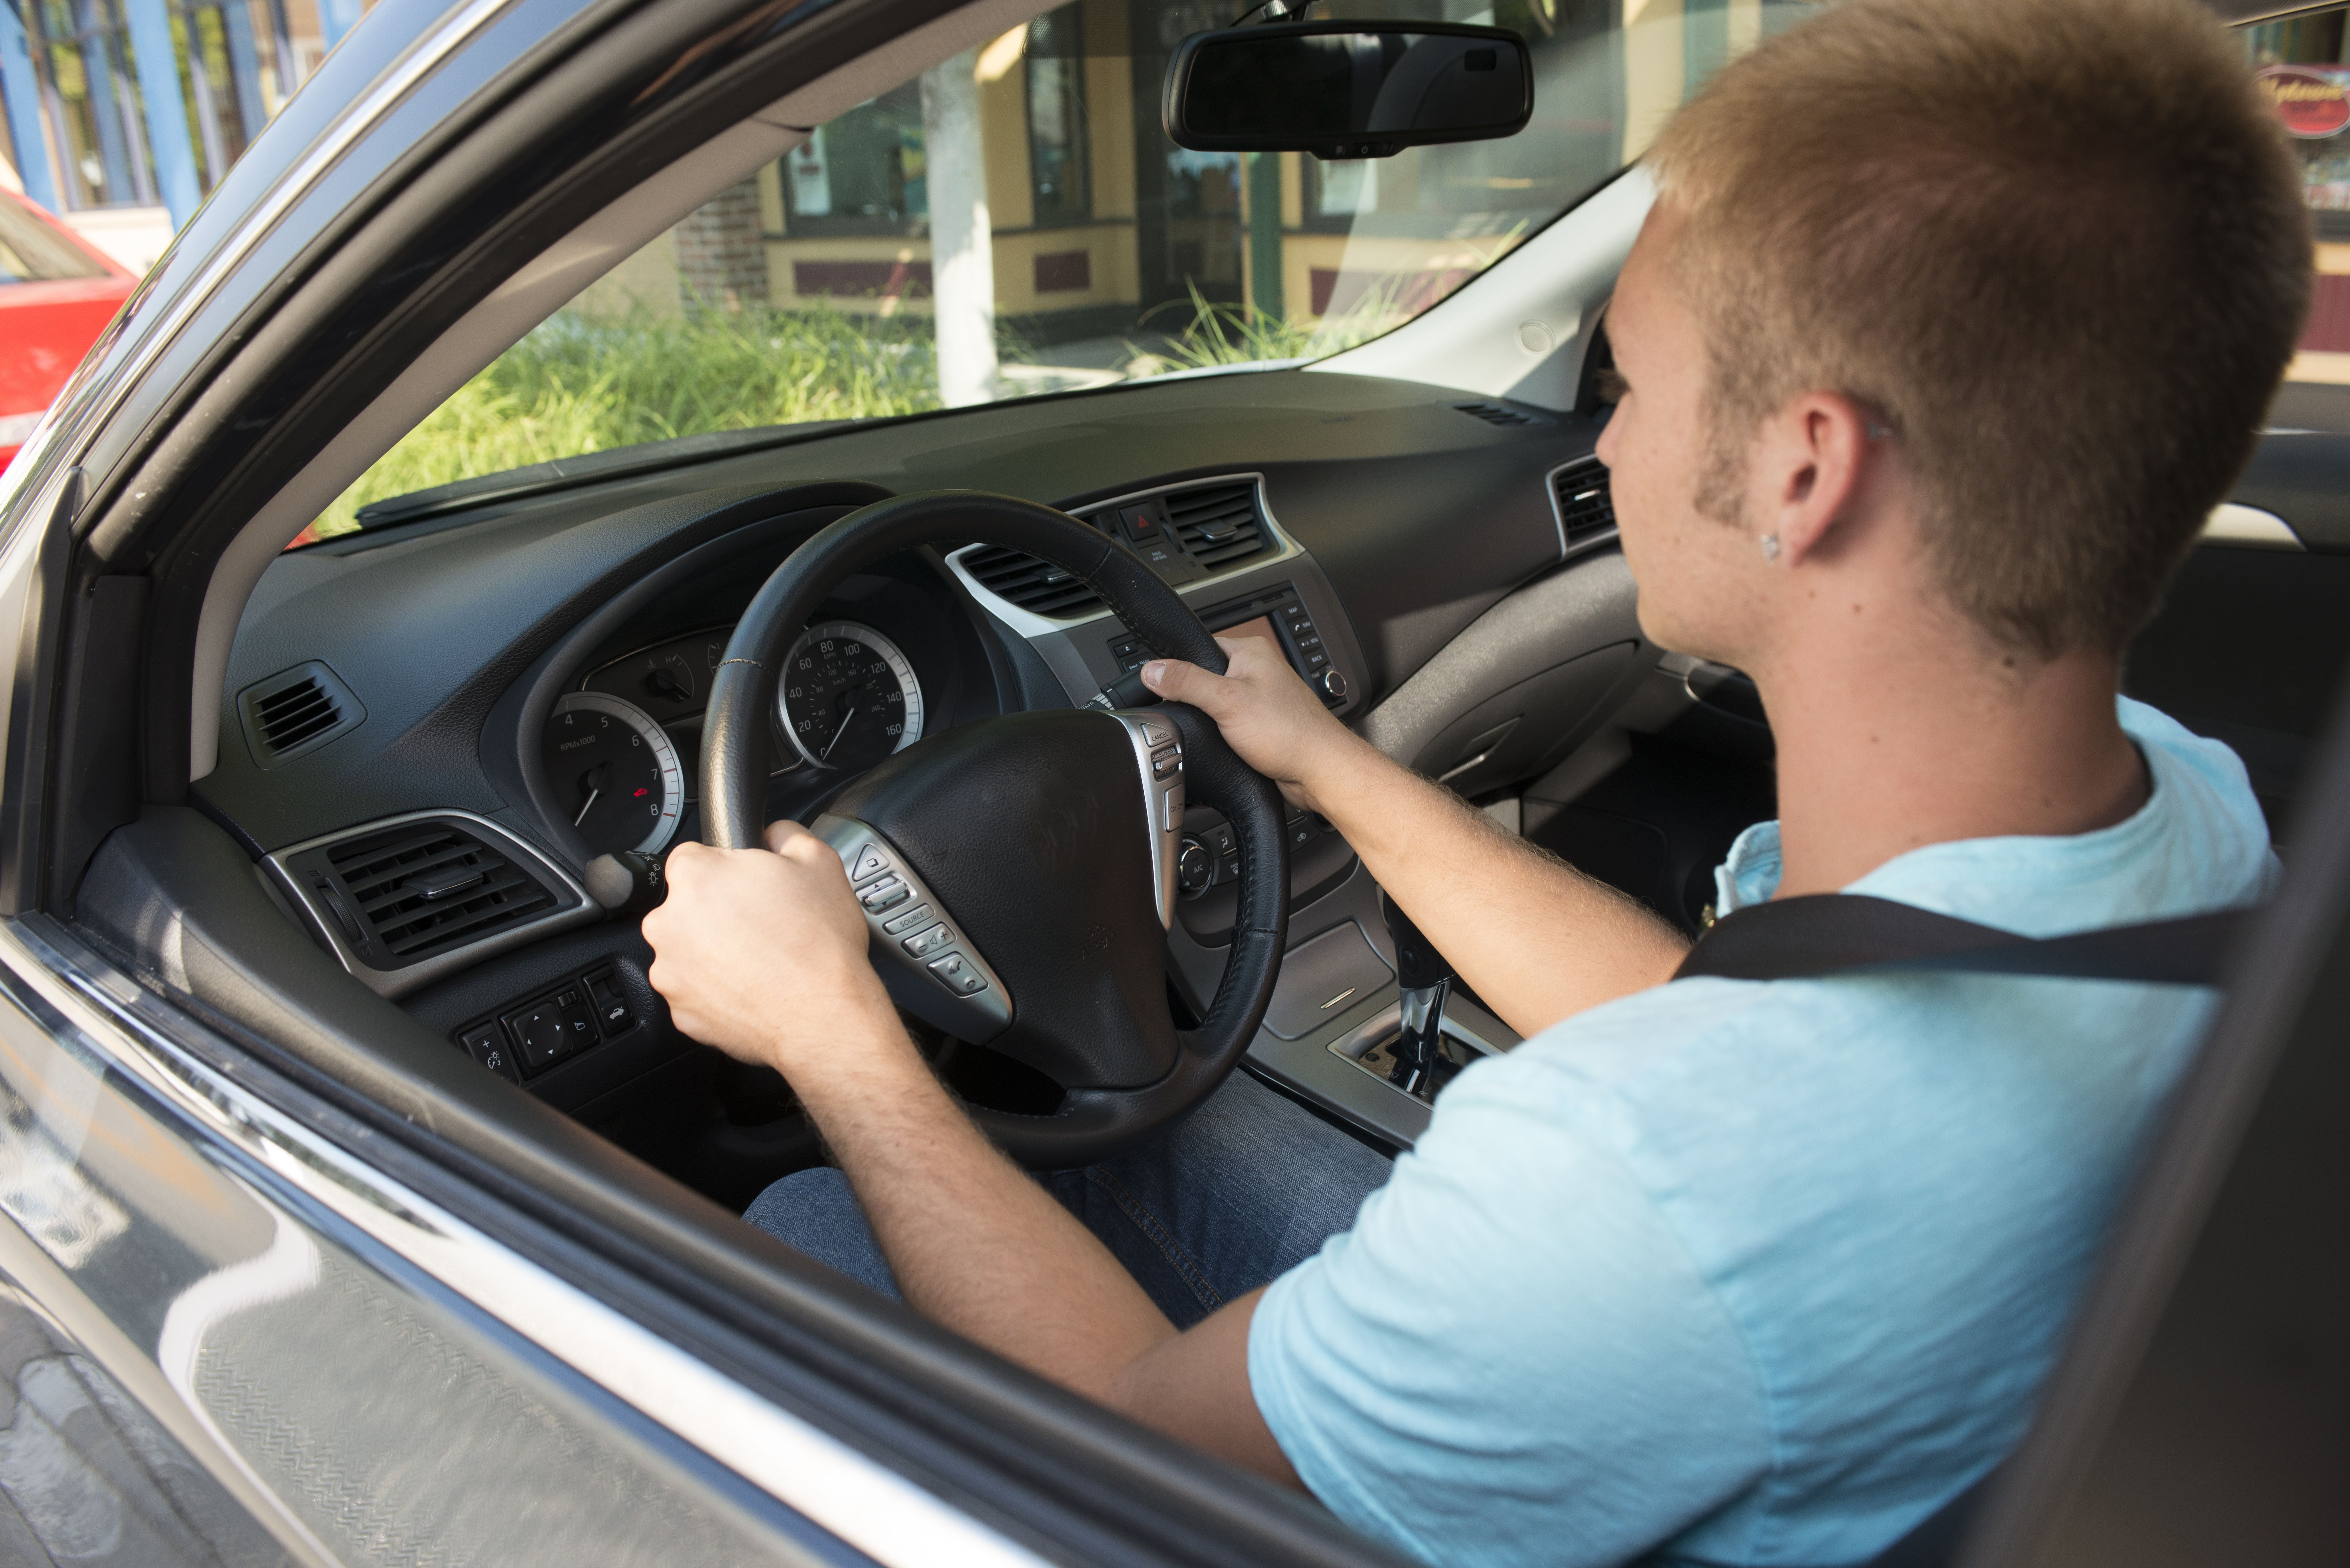 Drivers license male driver car insurance